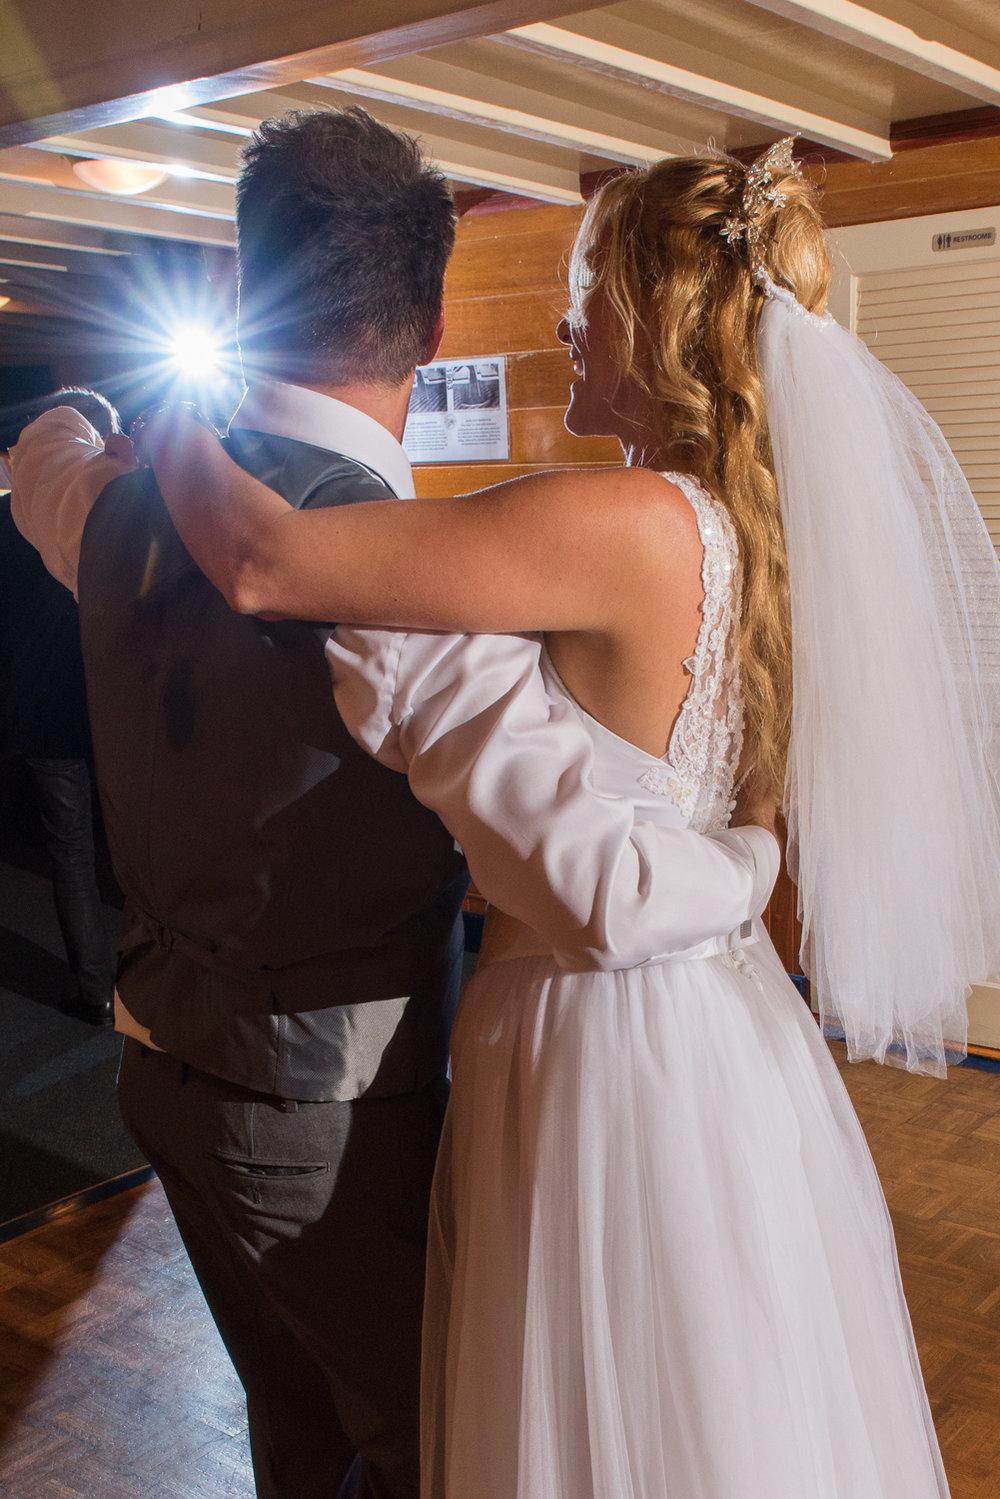 2016_September_04-nomad_lola_wedding_secondshooter-27985.jpg